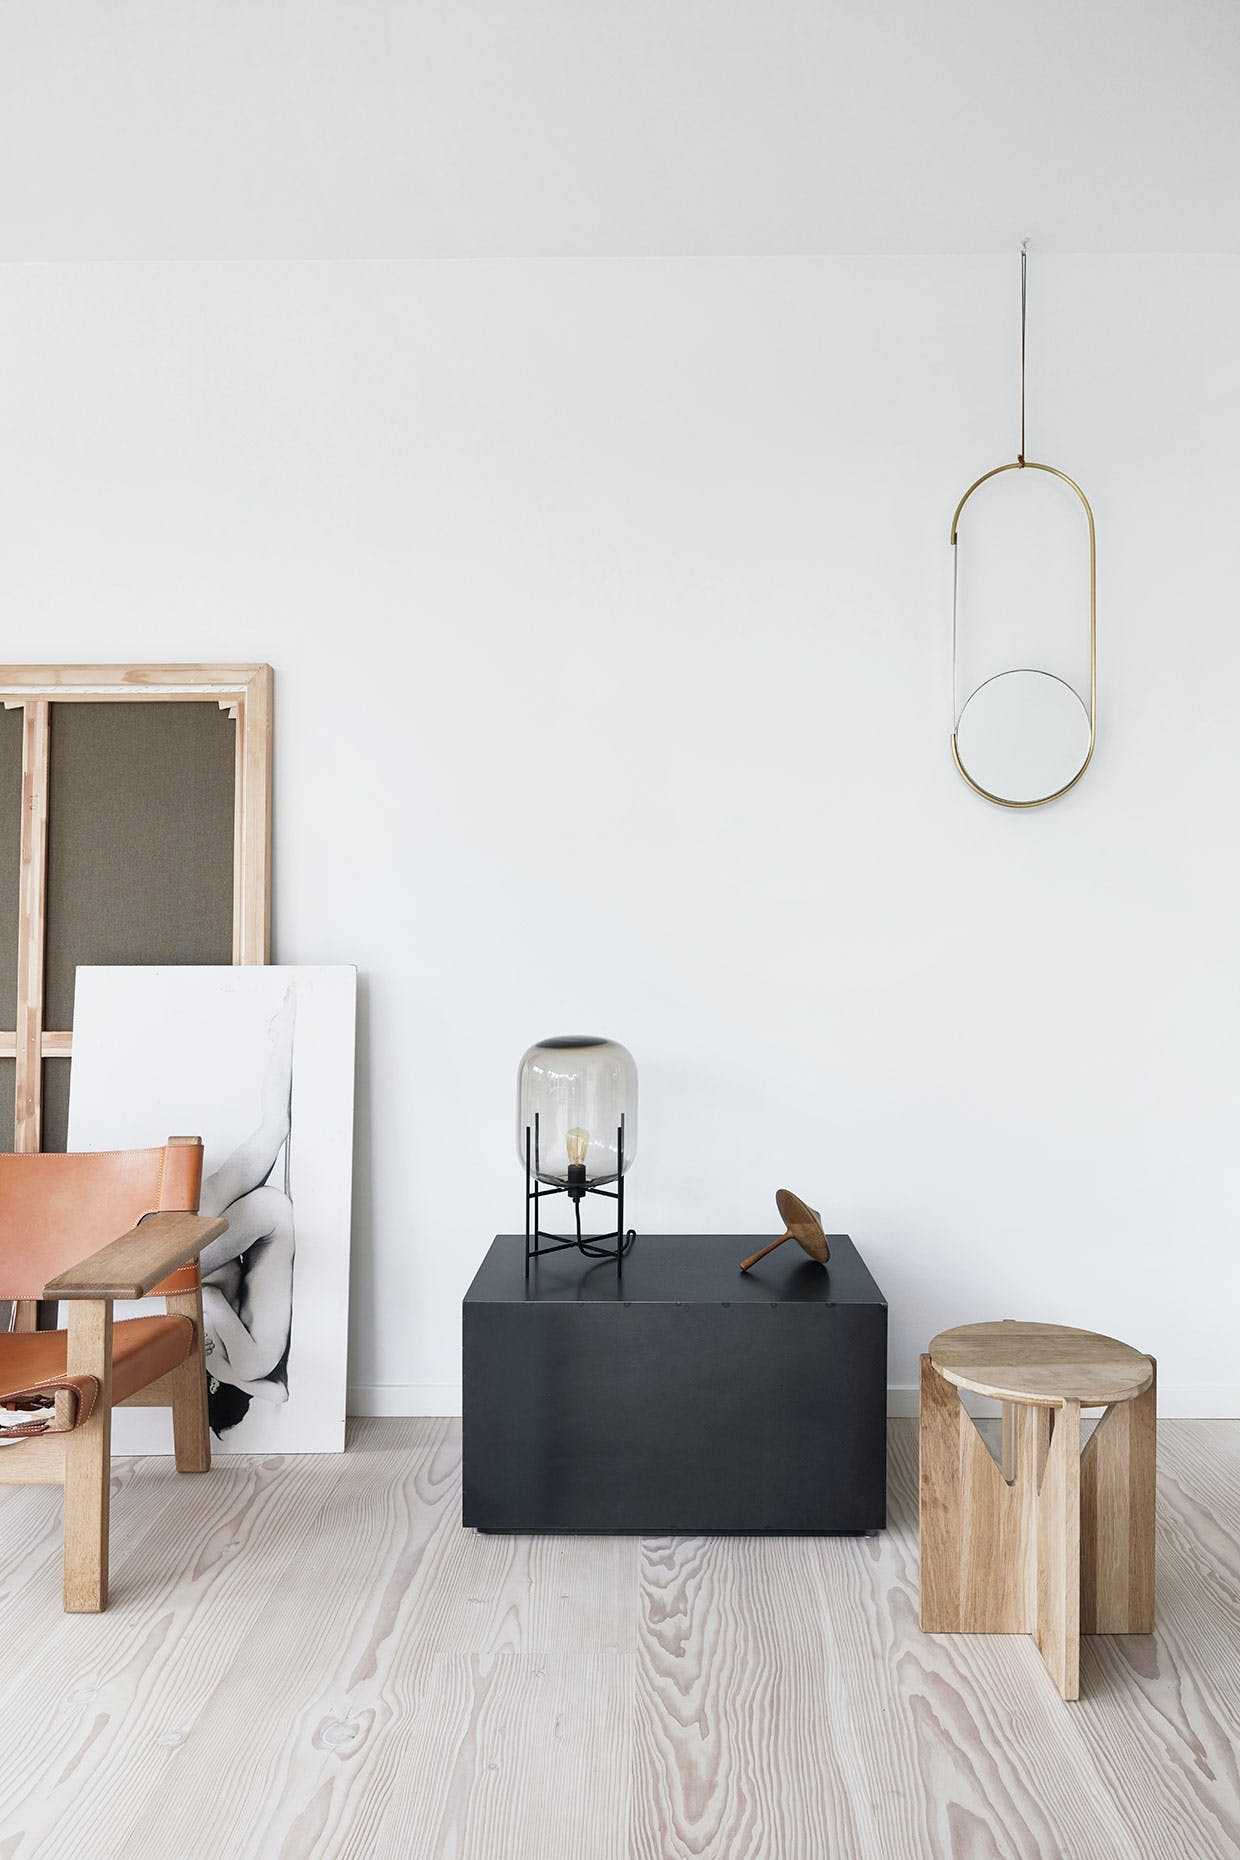 den spanske stol stool-taburet mobile mirror kristina dam oda lampe pulpo